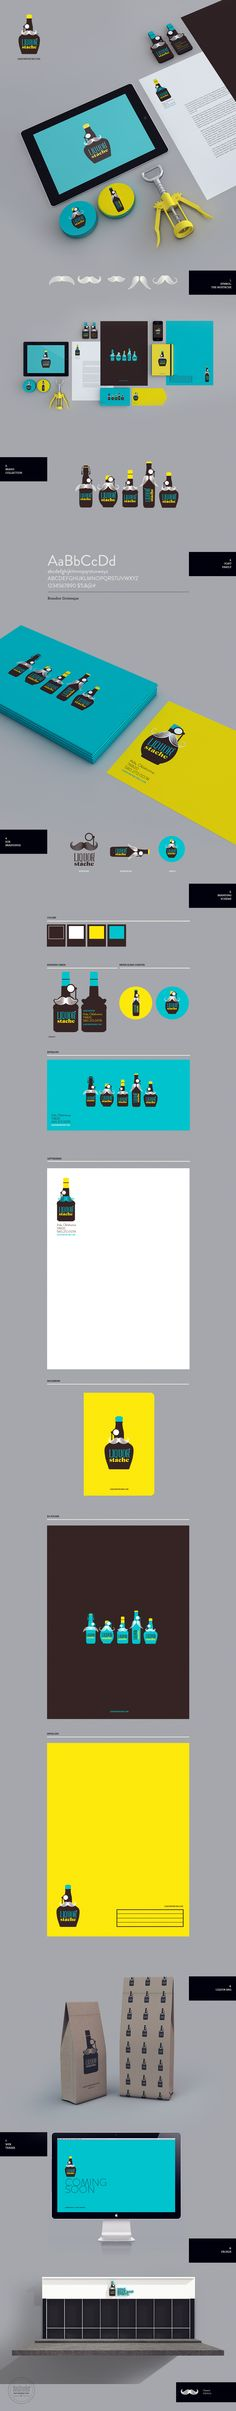 Cool Brand Identity Design. Liquor Stache. #branding #brandidentity [http://www.pinterest.com/alfredchong/]